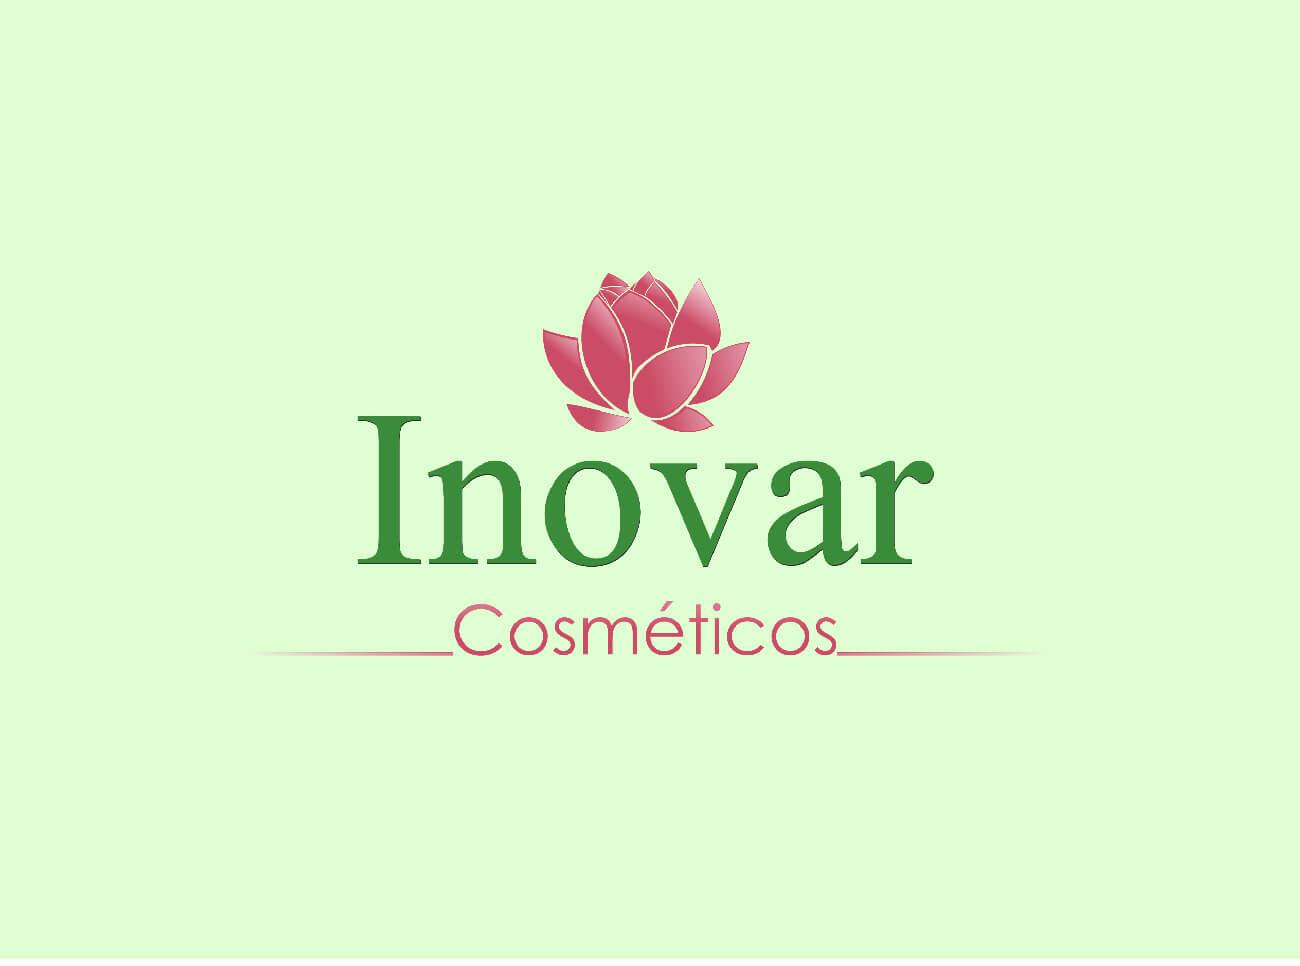 inovar-cosmeticos